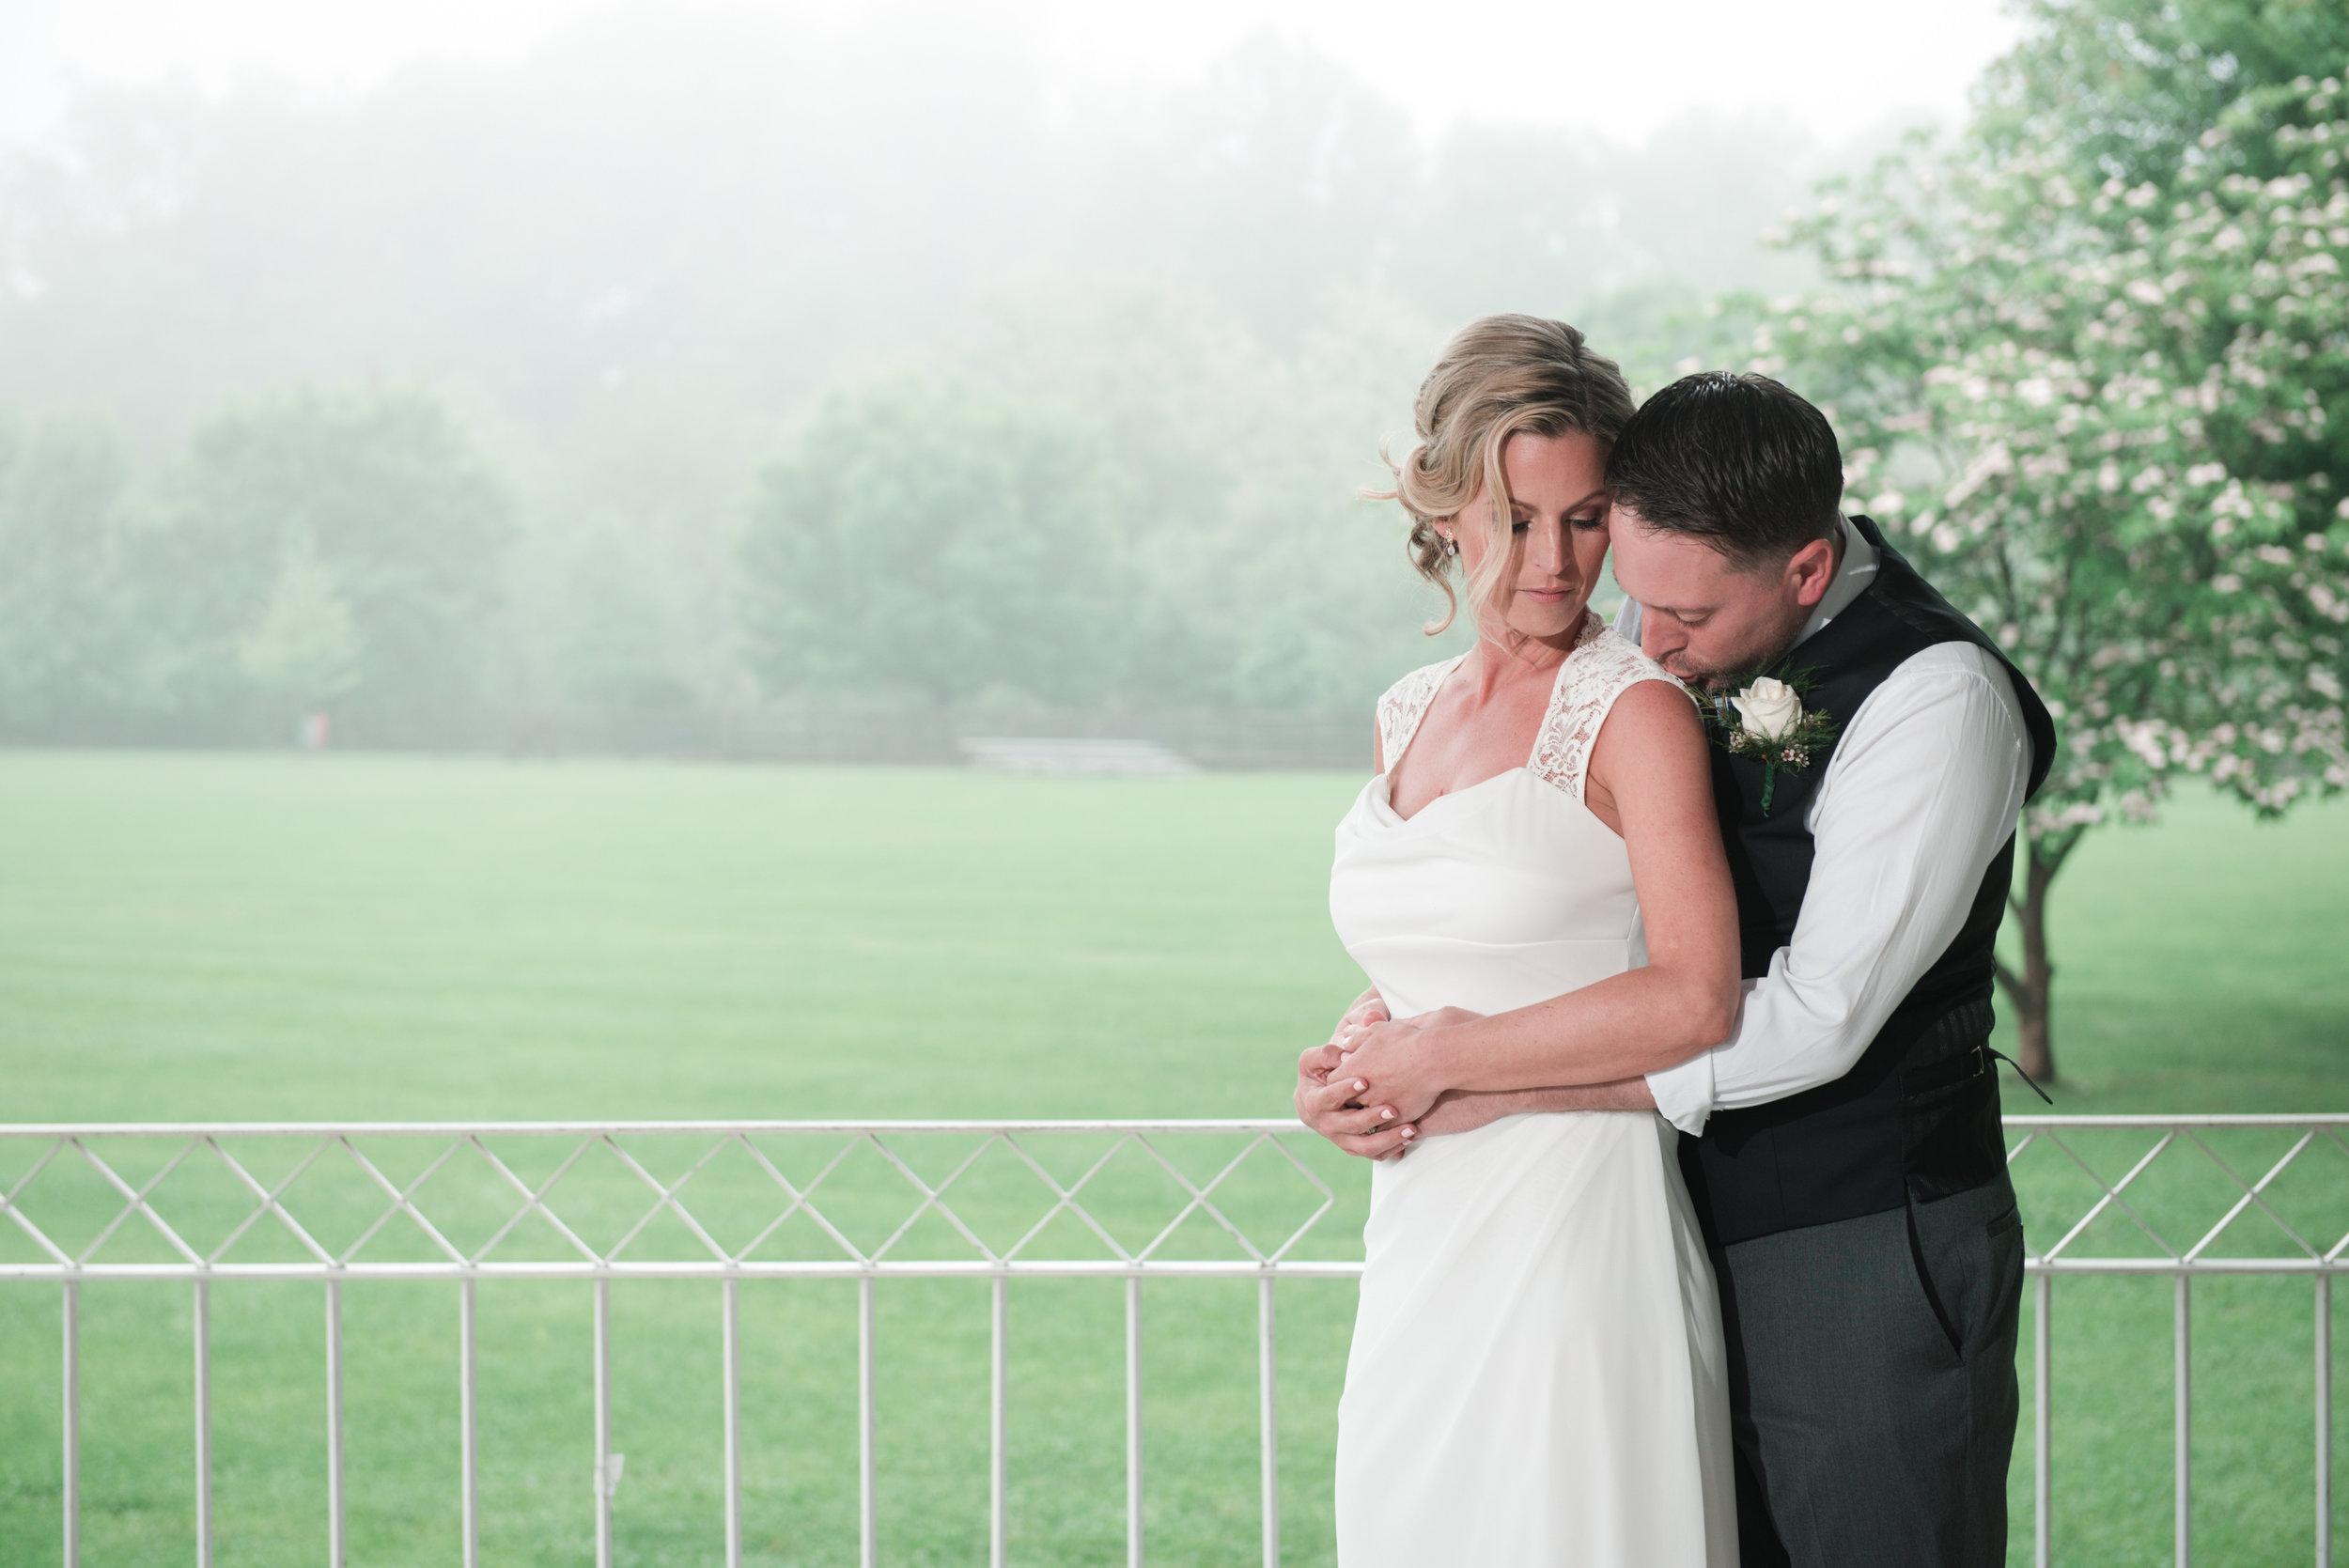 Mariani_wedding_kevkramerphoto-081.jpg